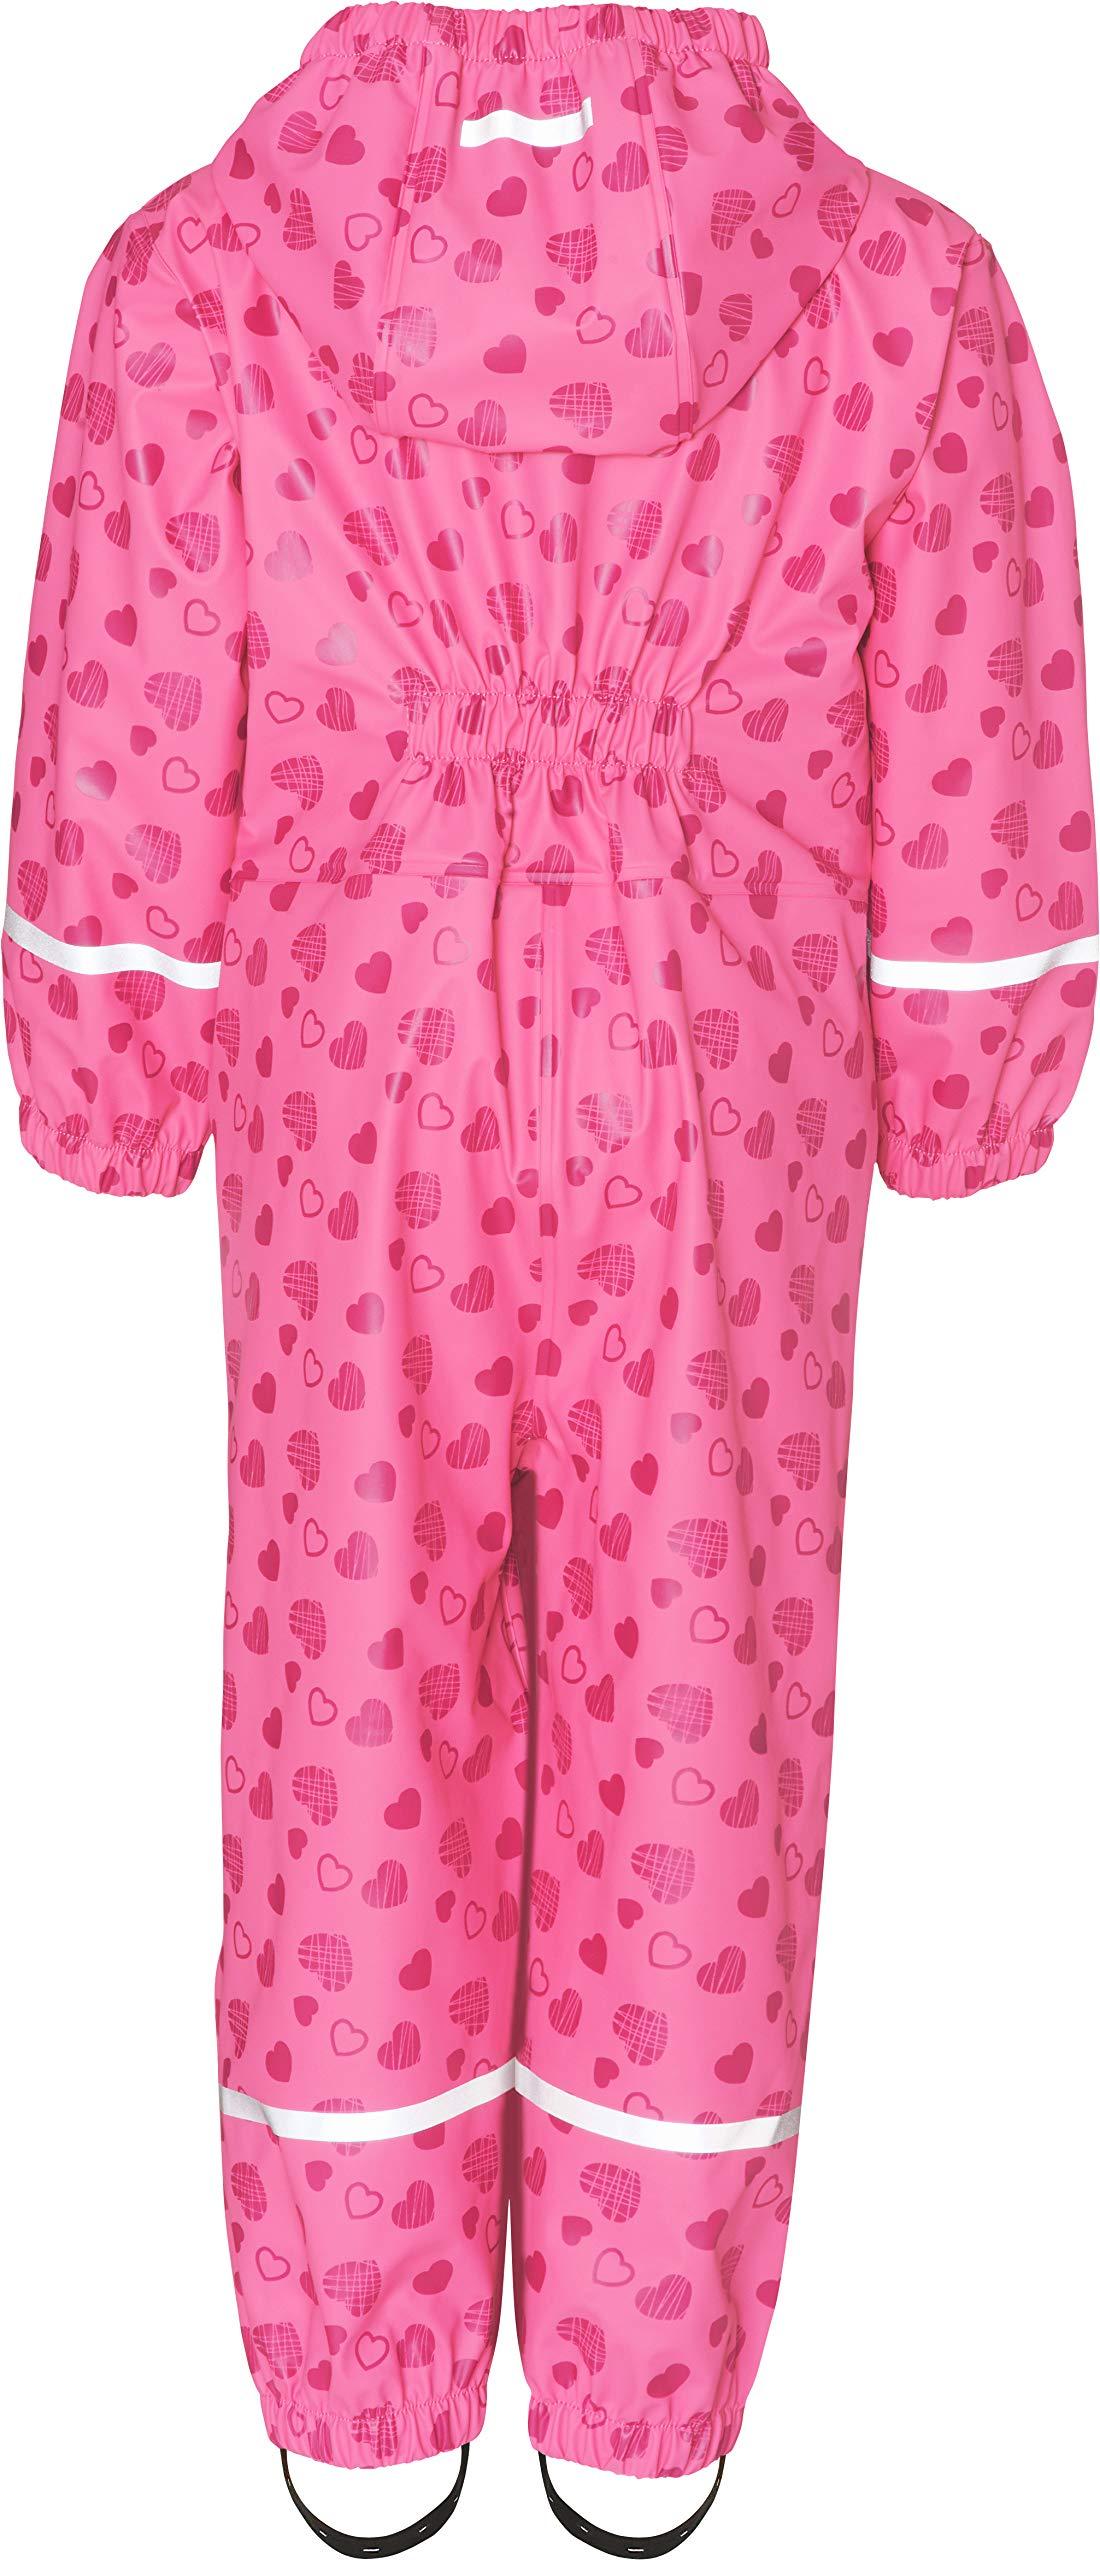 Playshoes Regen-Overall Herzchen Allover Pantalones Impermeable para Bebés 2